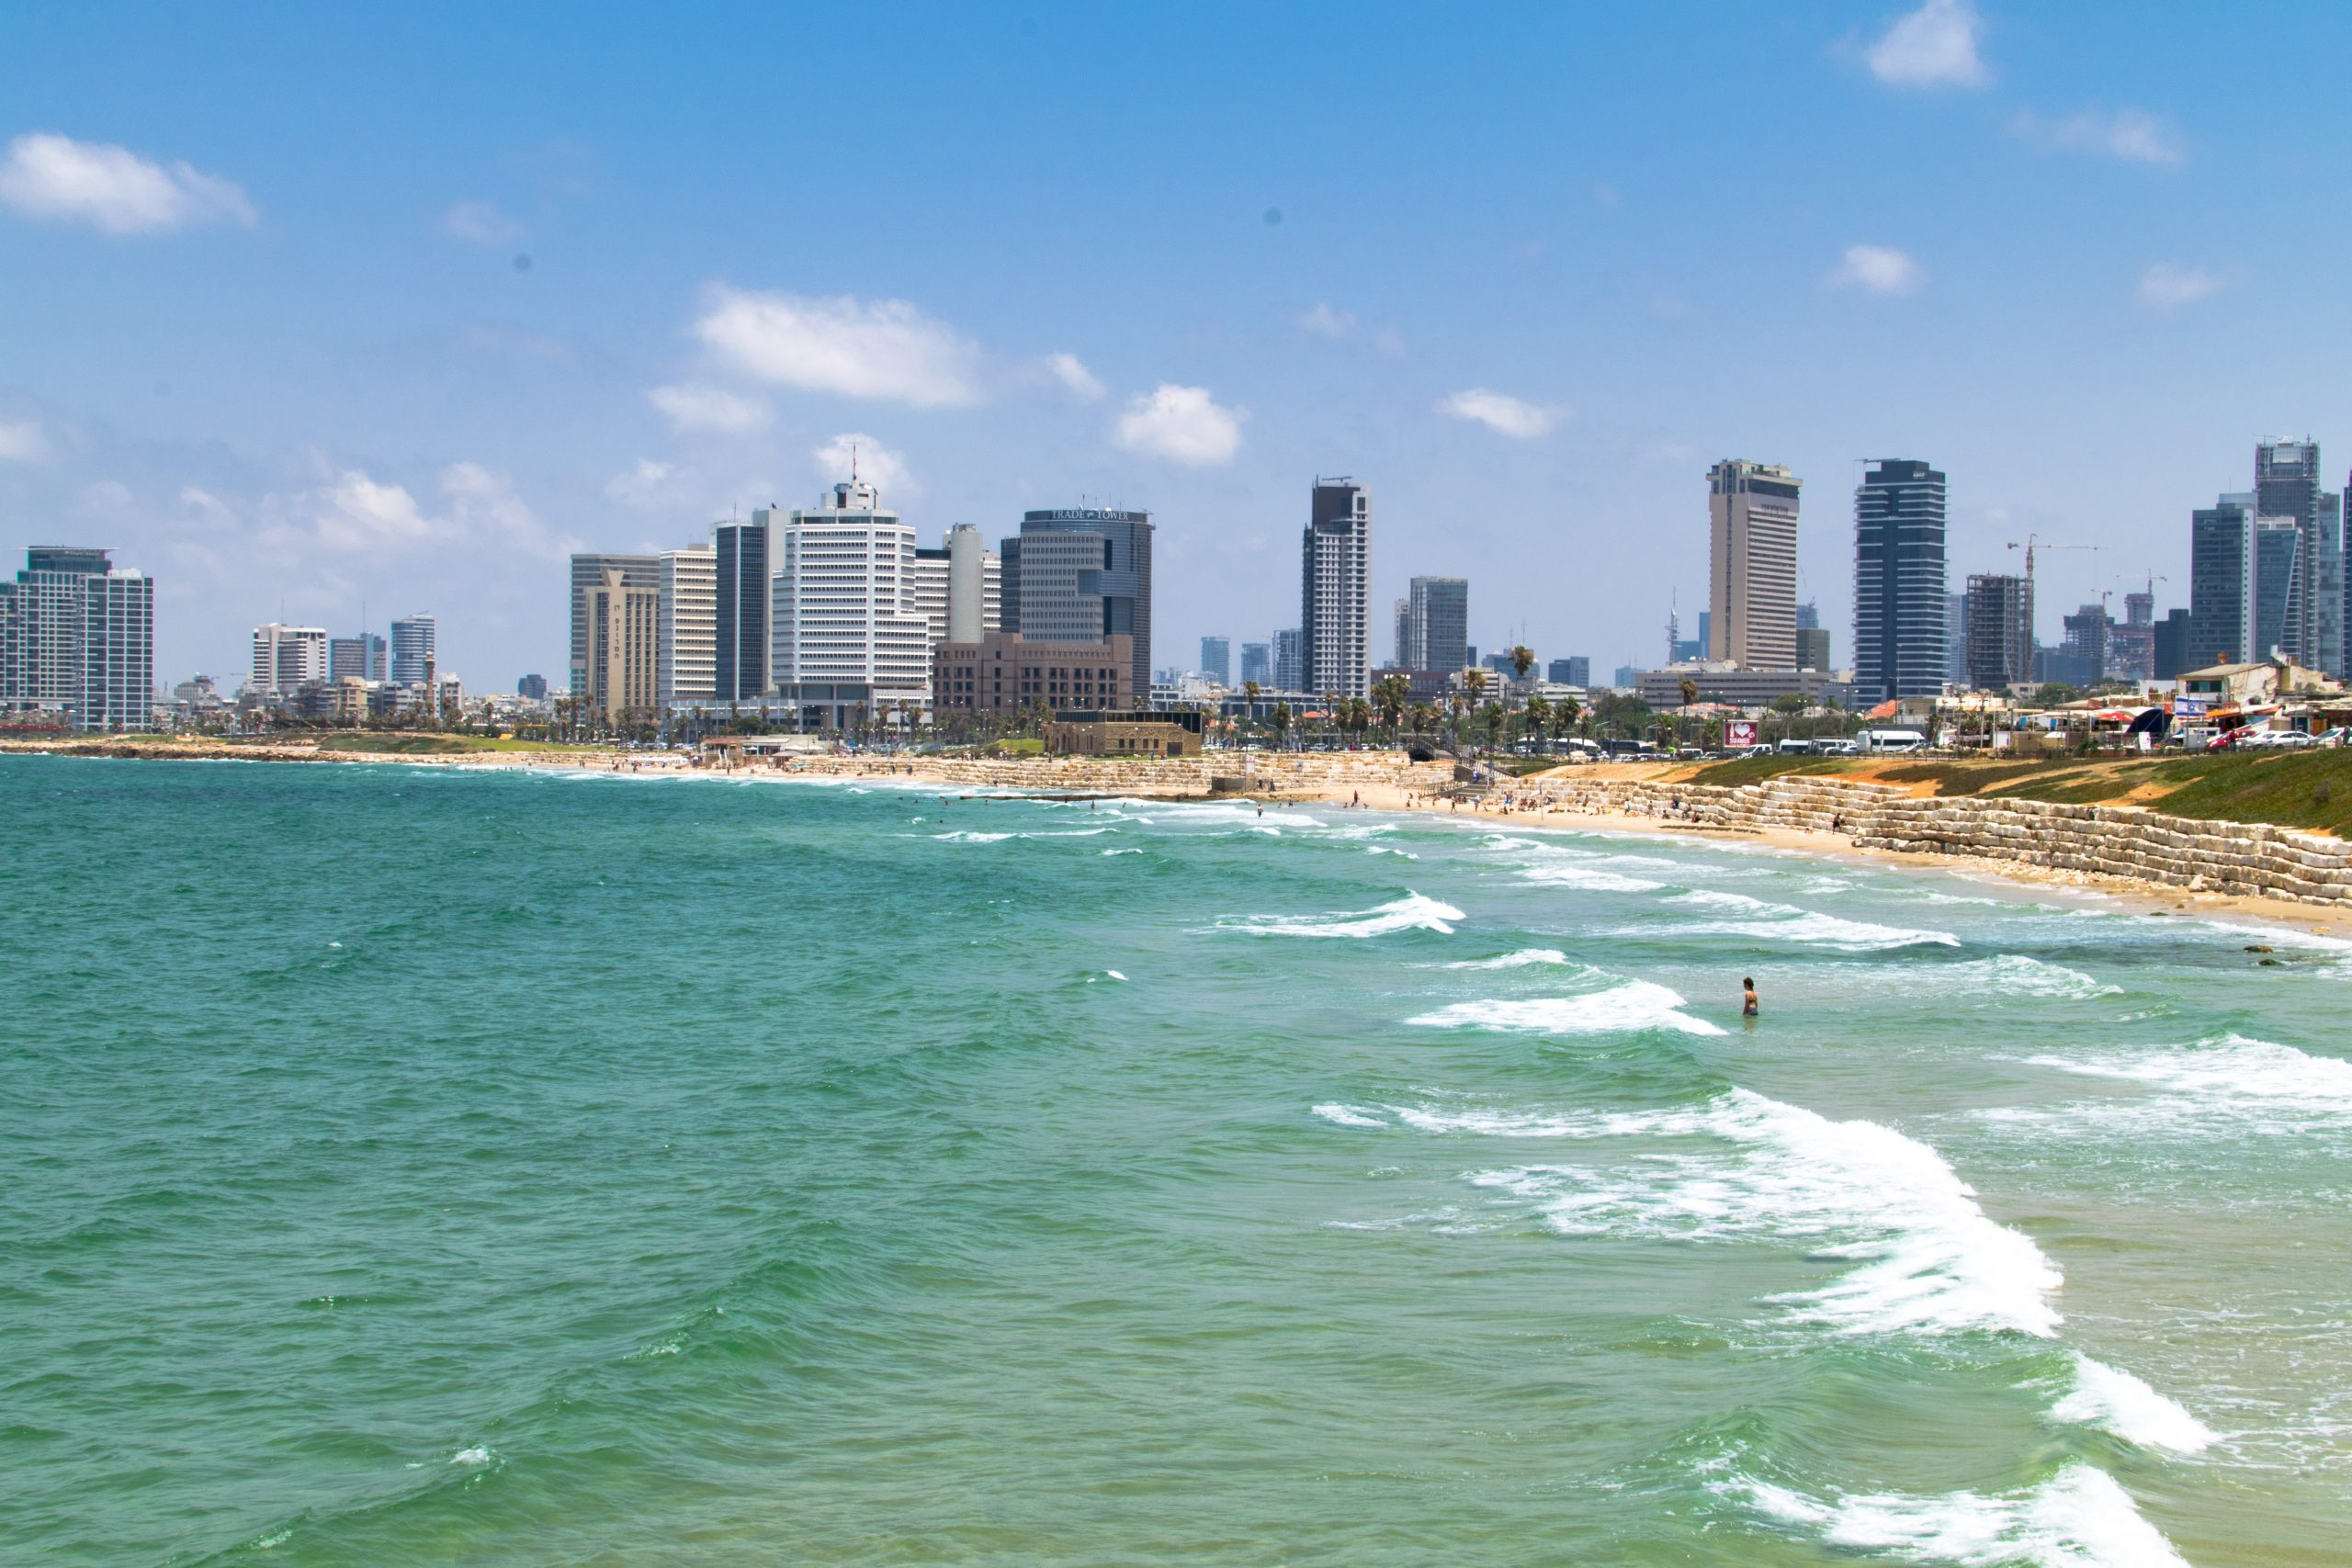 coastline of Tel Aviv - Jaffa